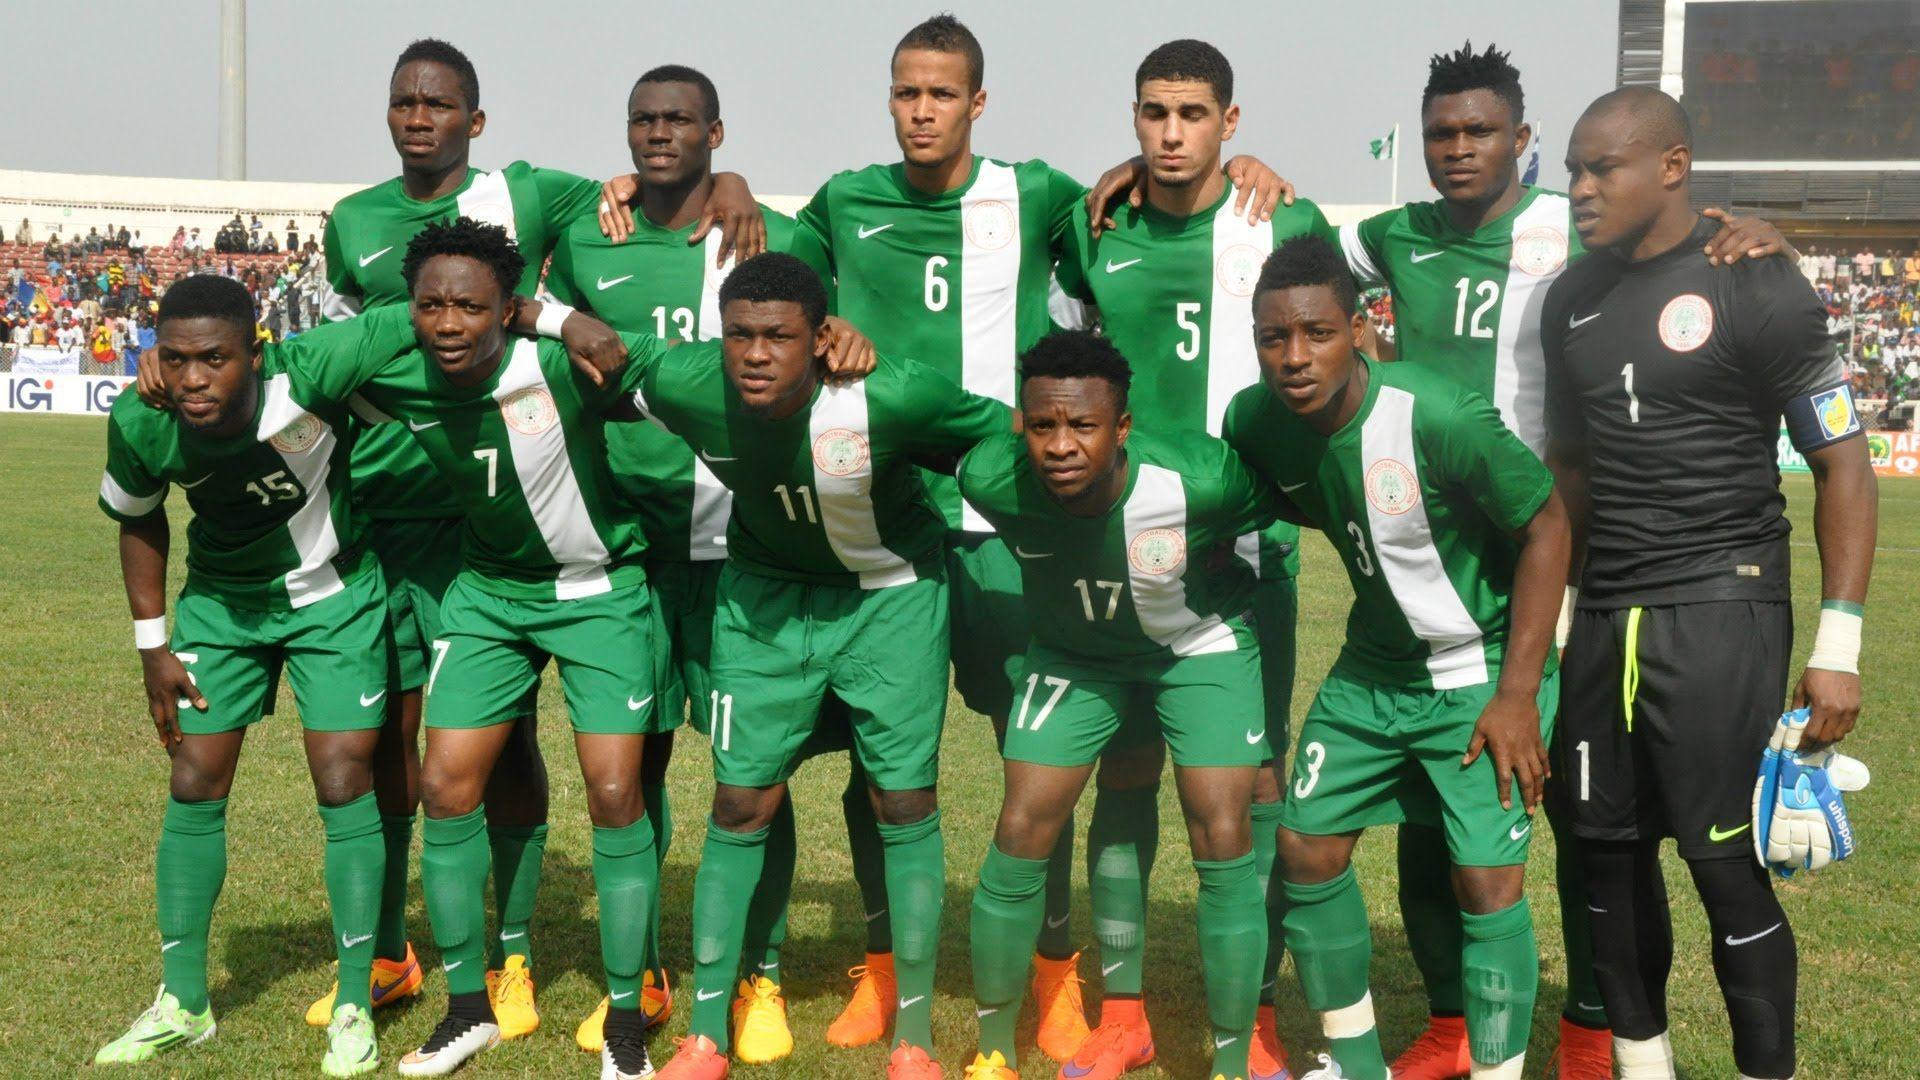 Nigeria National Football Team Teams Backgrounds 4